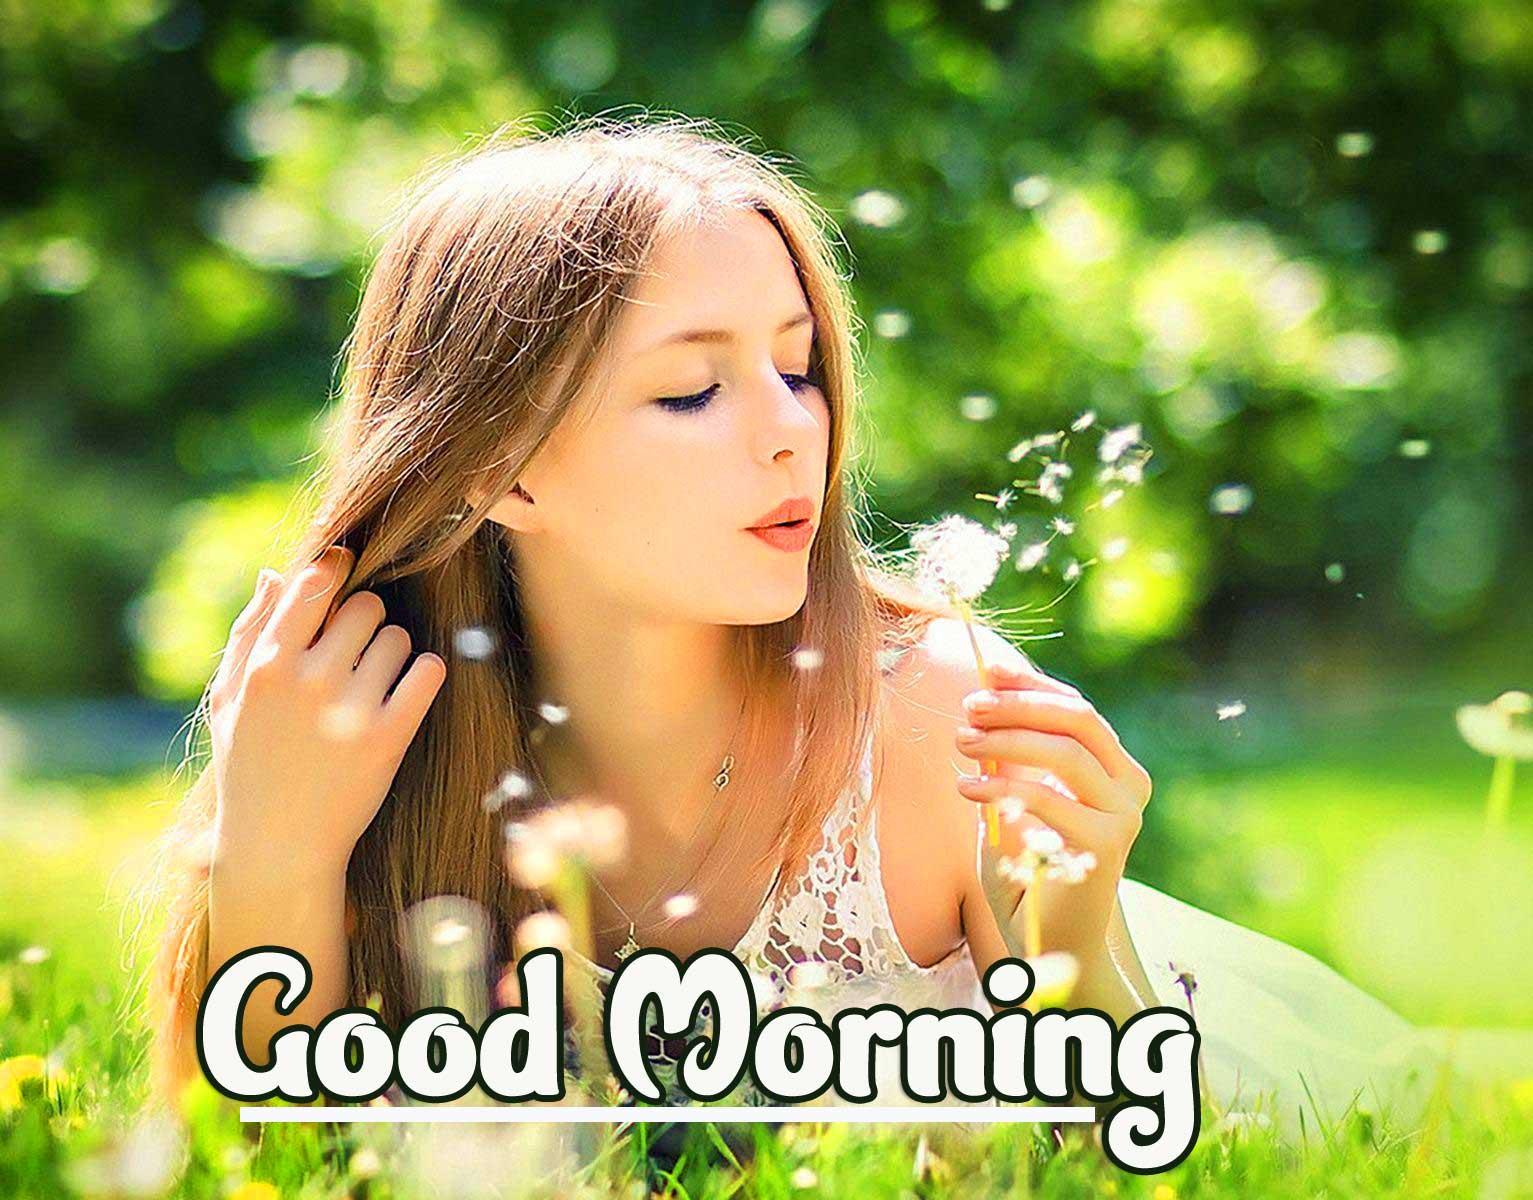 Good Morning Beautiful Ladies / Stylish Girls Images pics for Whatsapp